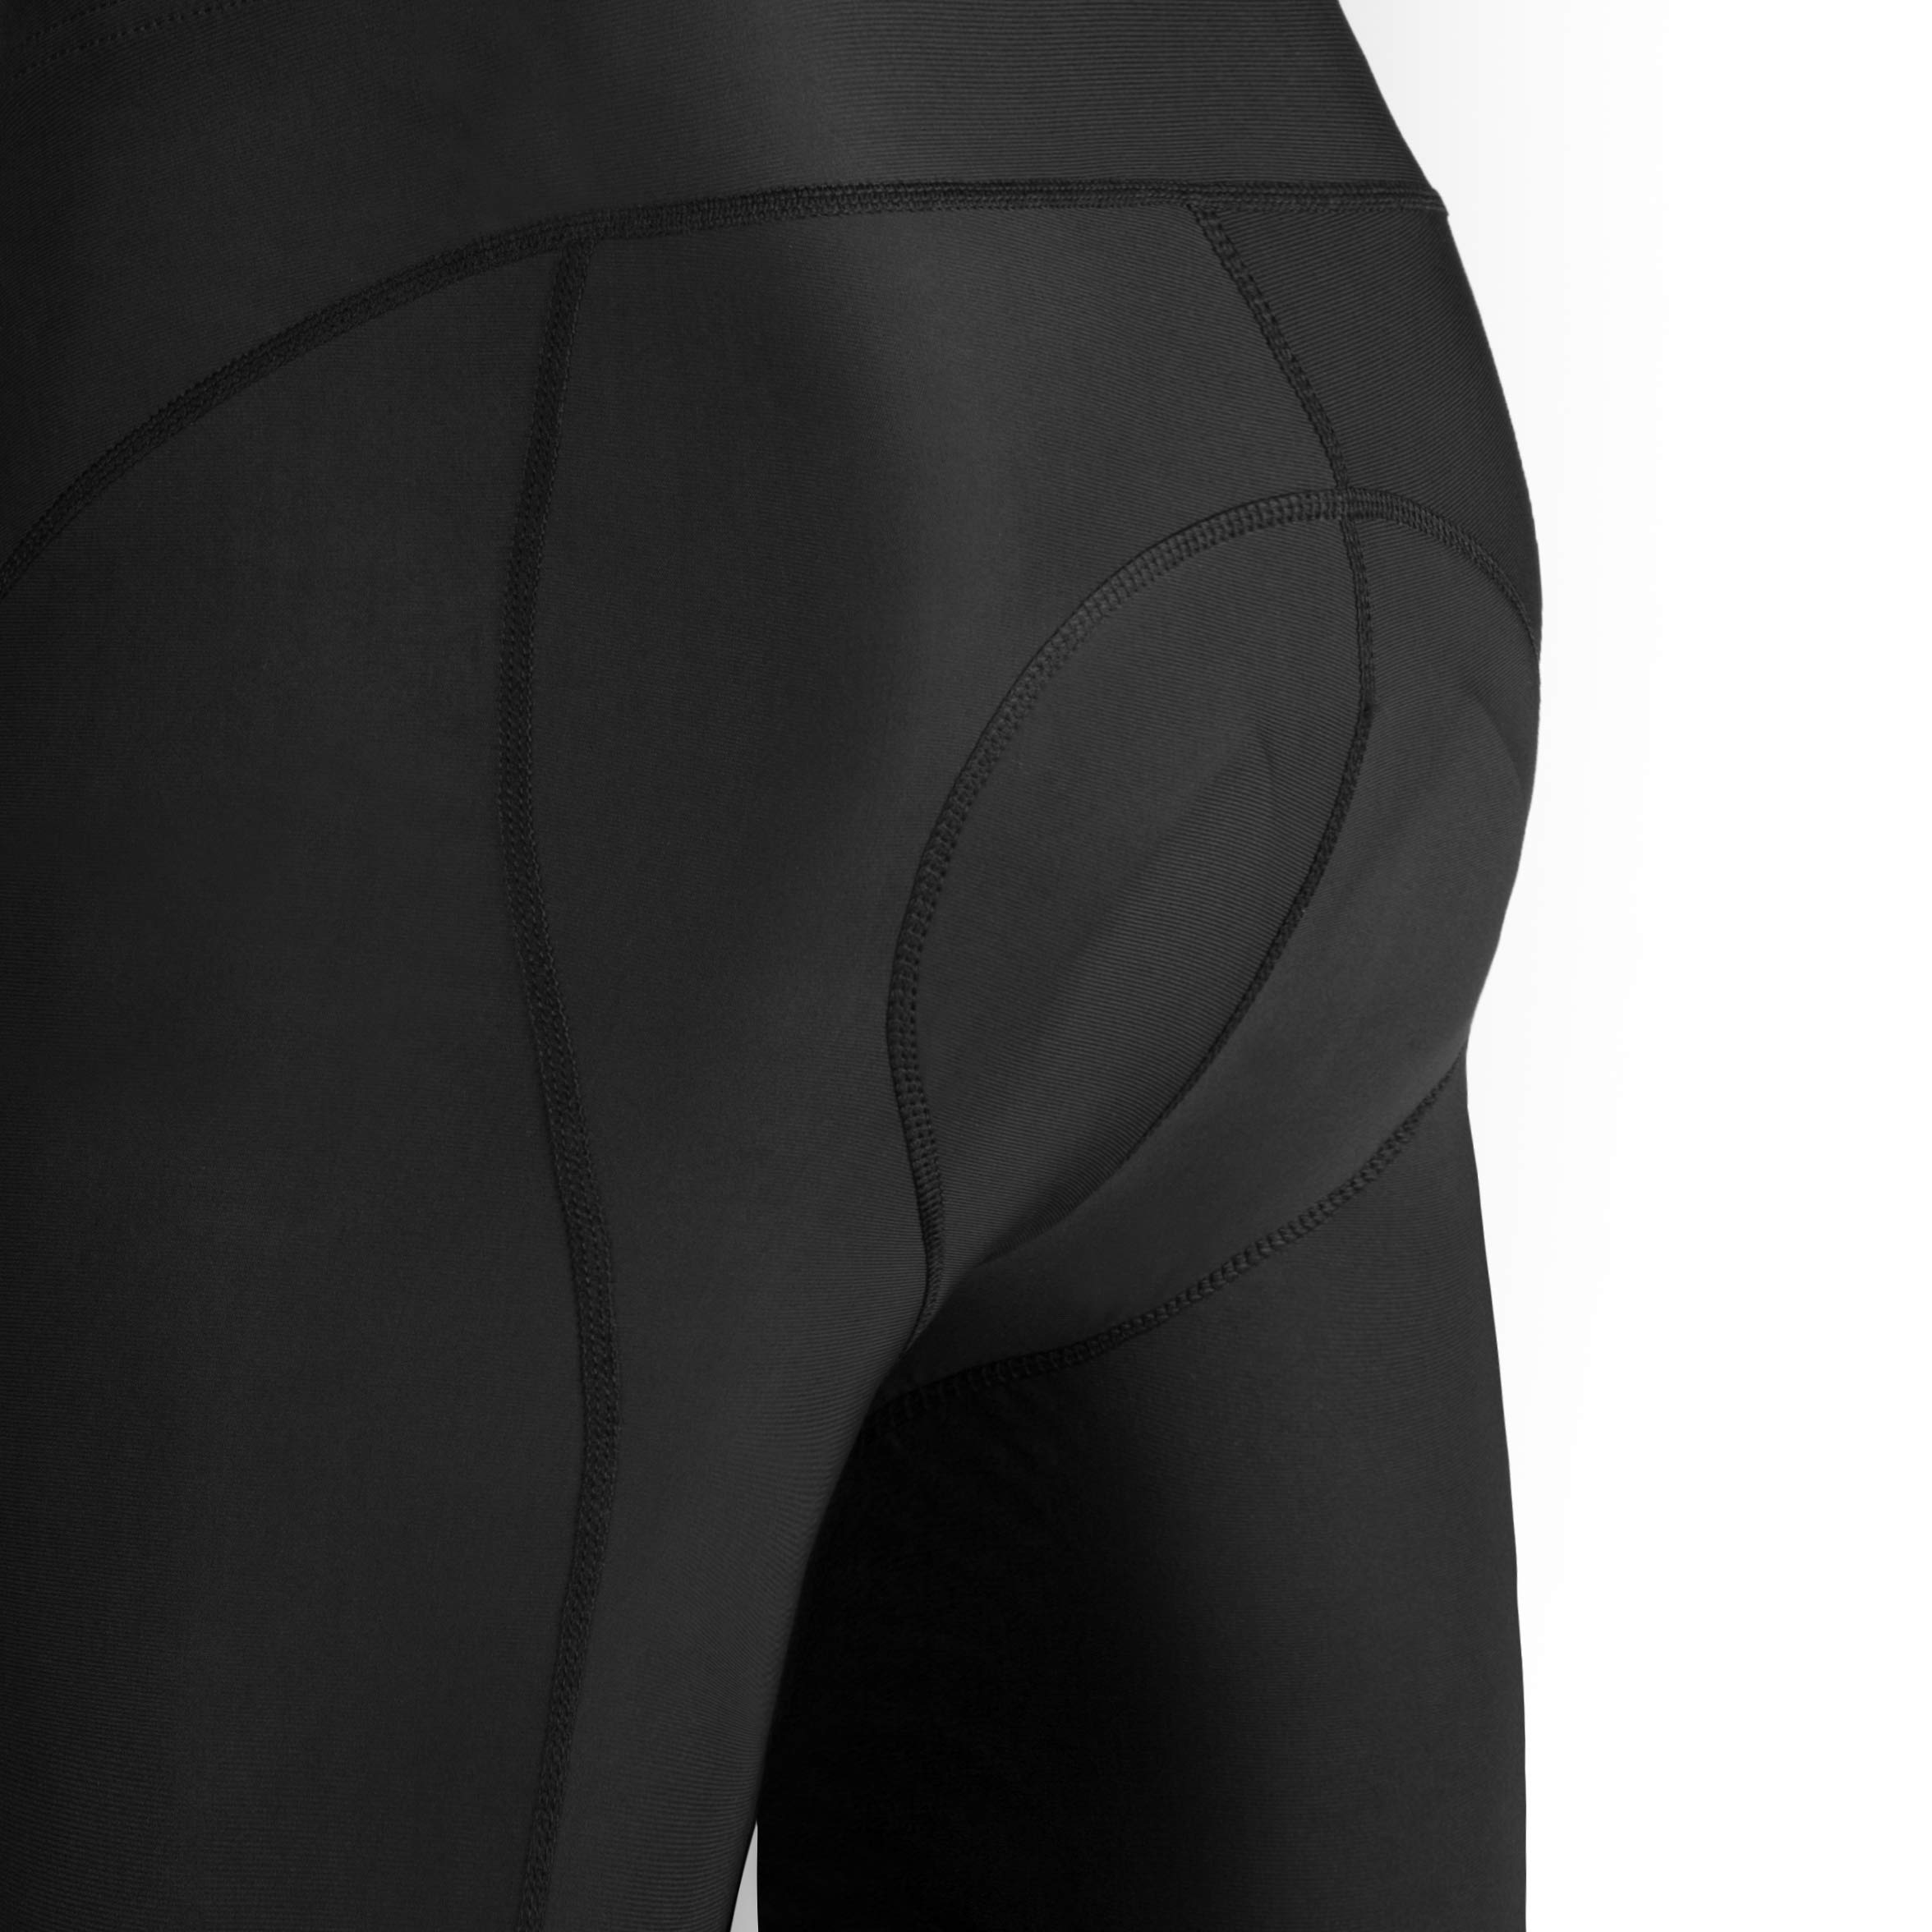 Przewalski Men's Cycling Bib Shorts, 4D Padded Compression Bike Tights Breathable Bicycle Pants UPF 50+, Classic Series, Black/XL by Przewalski (Image #8)